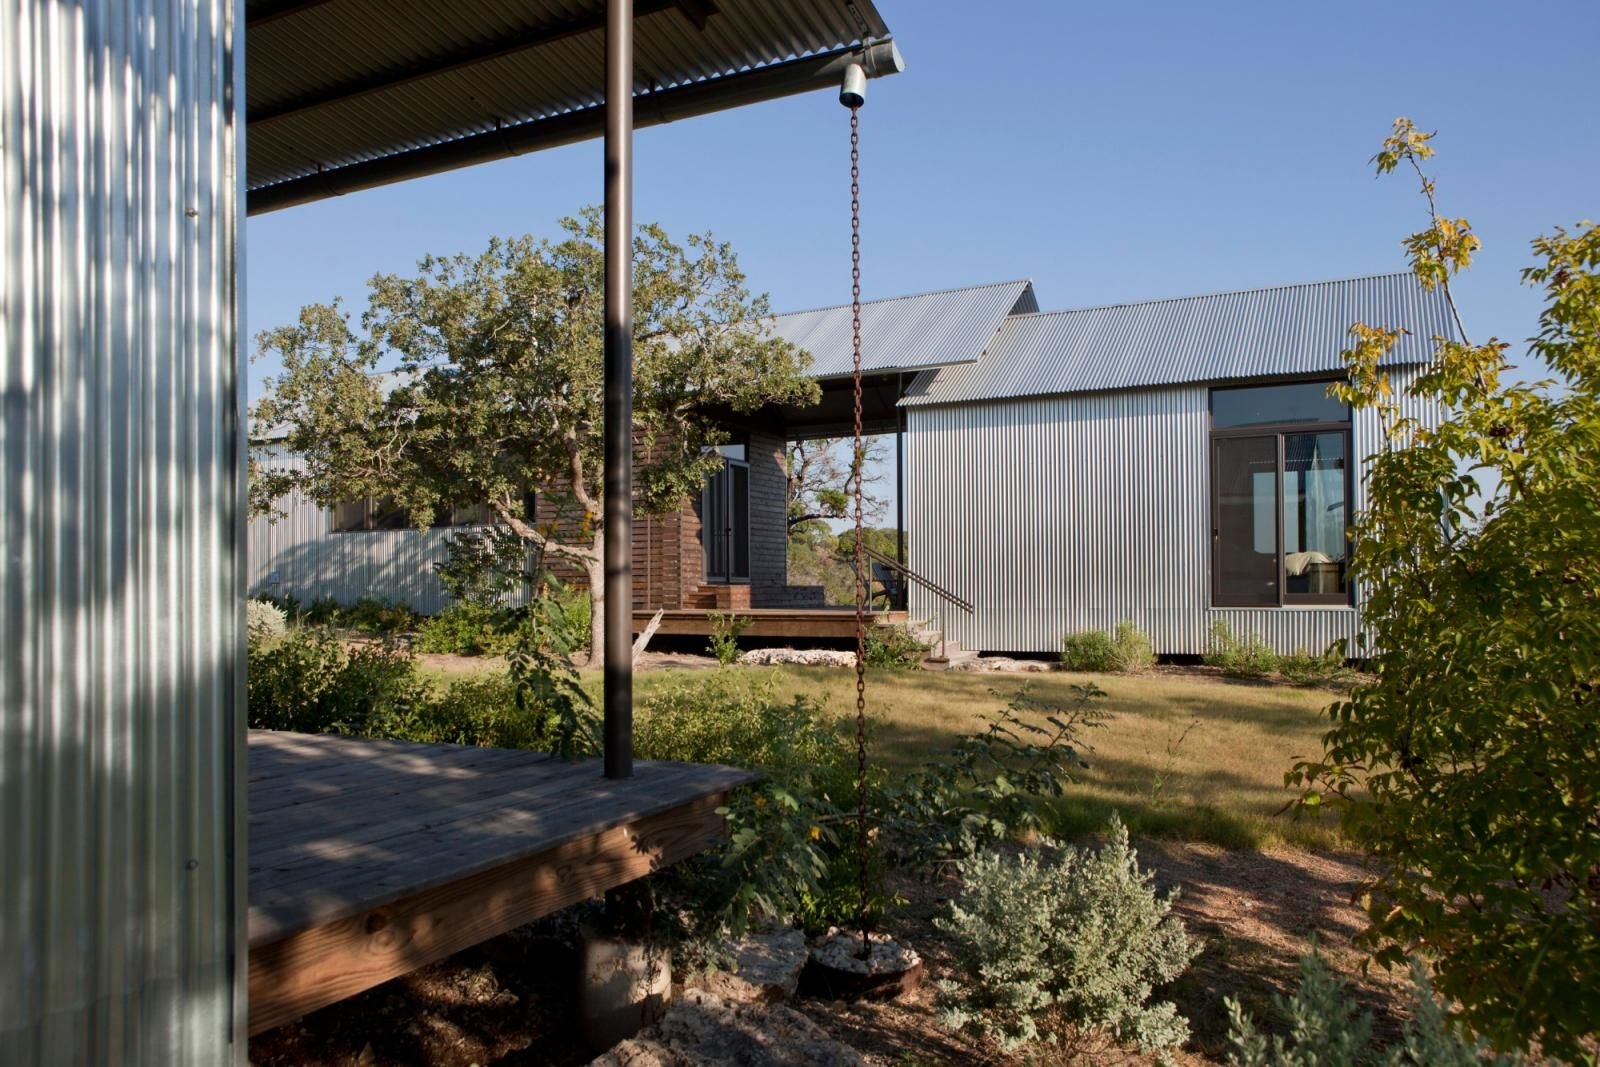 Miller Ranch Lake Flato, architecture; dog trot, porch